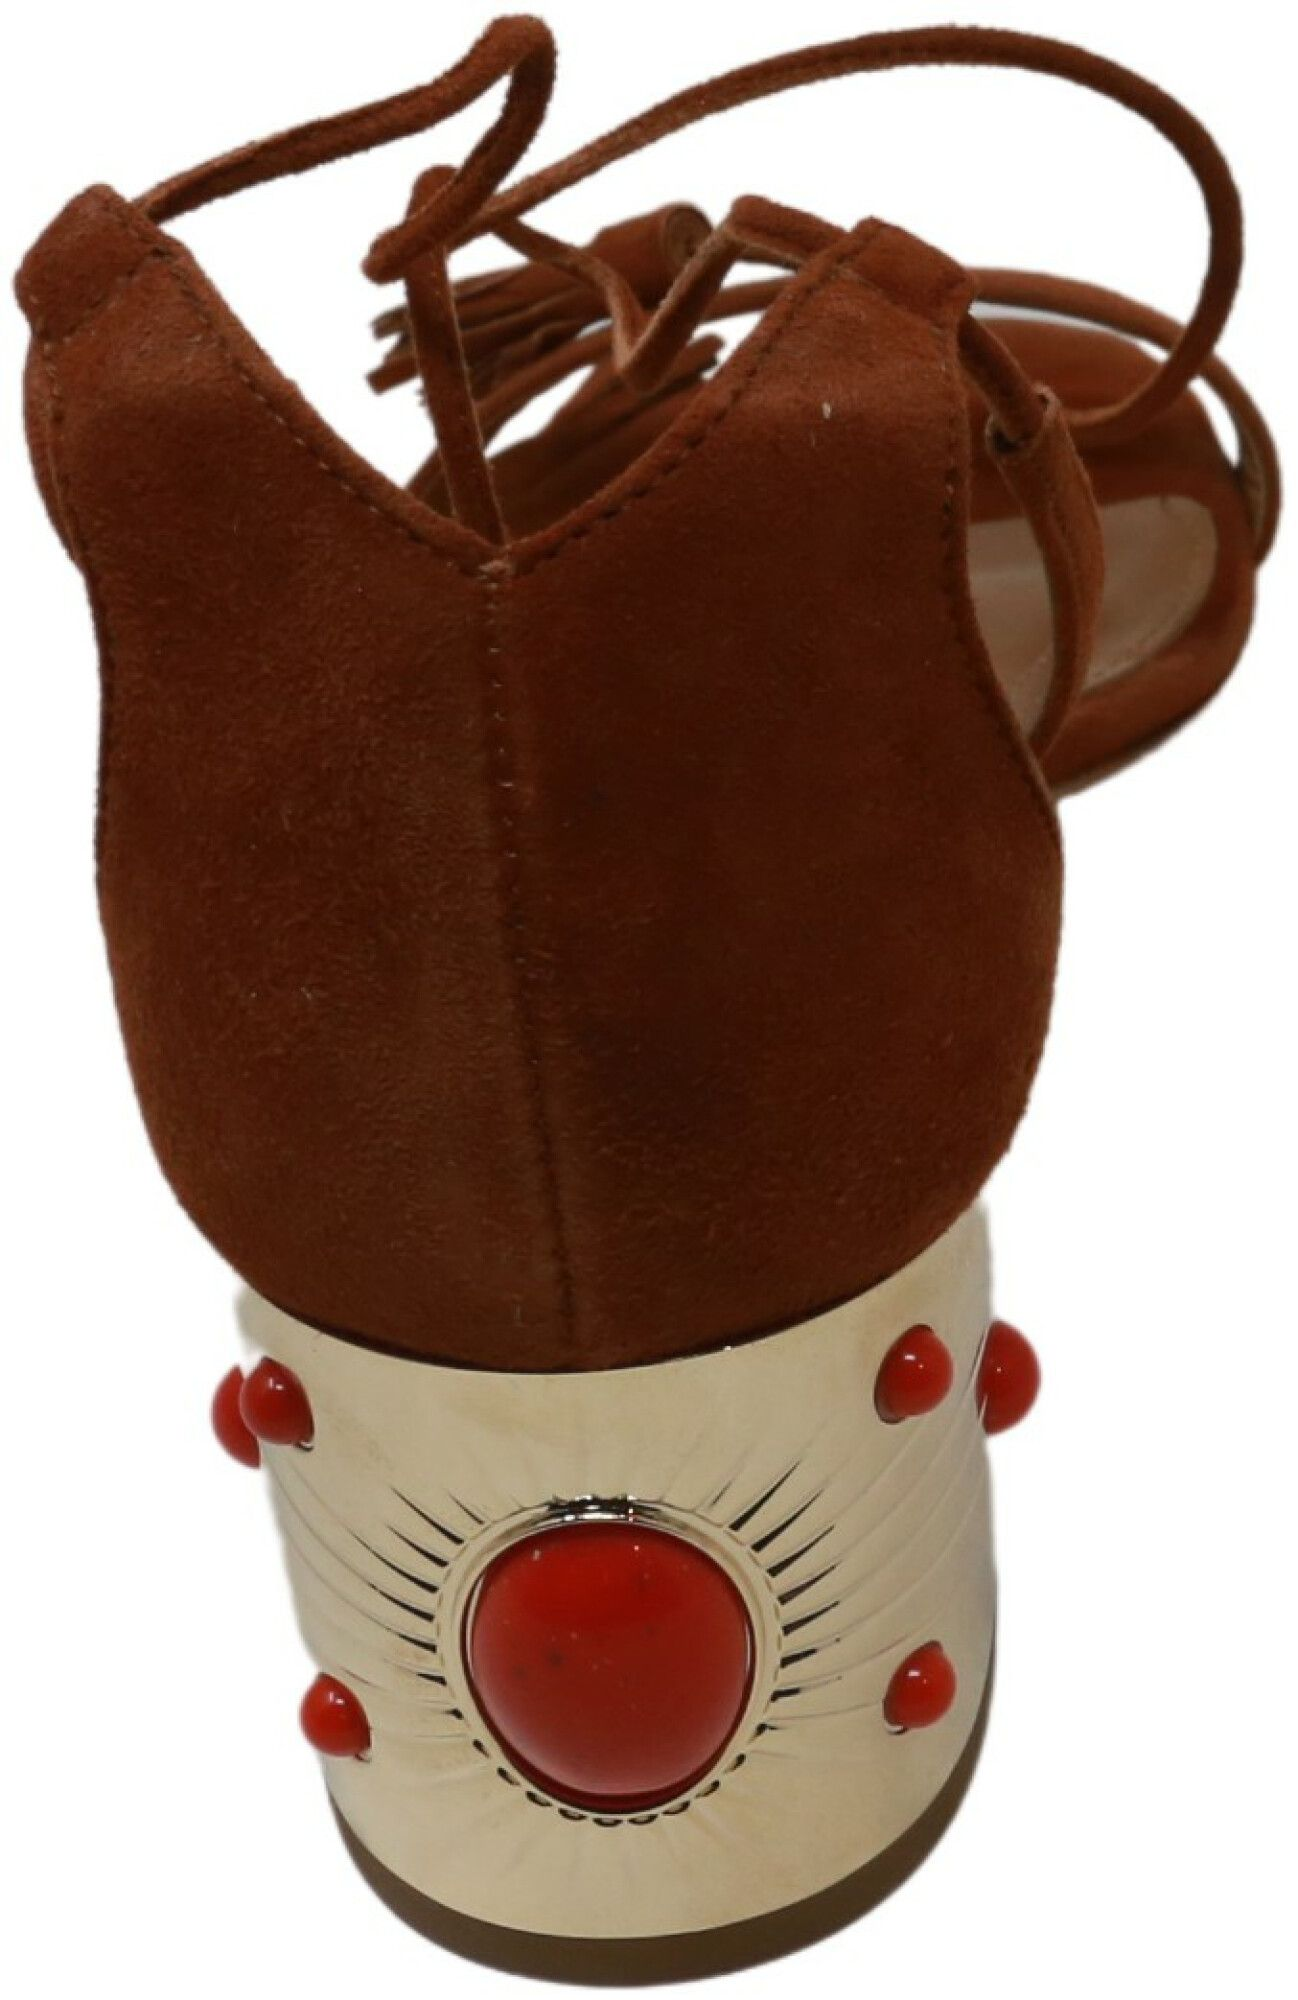 Aquazzura Firenze Women's Cleopatra Sandal 50 Suede Ankle-High Pump